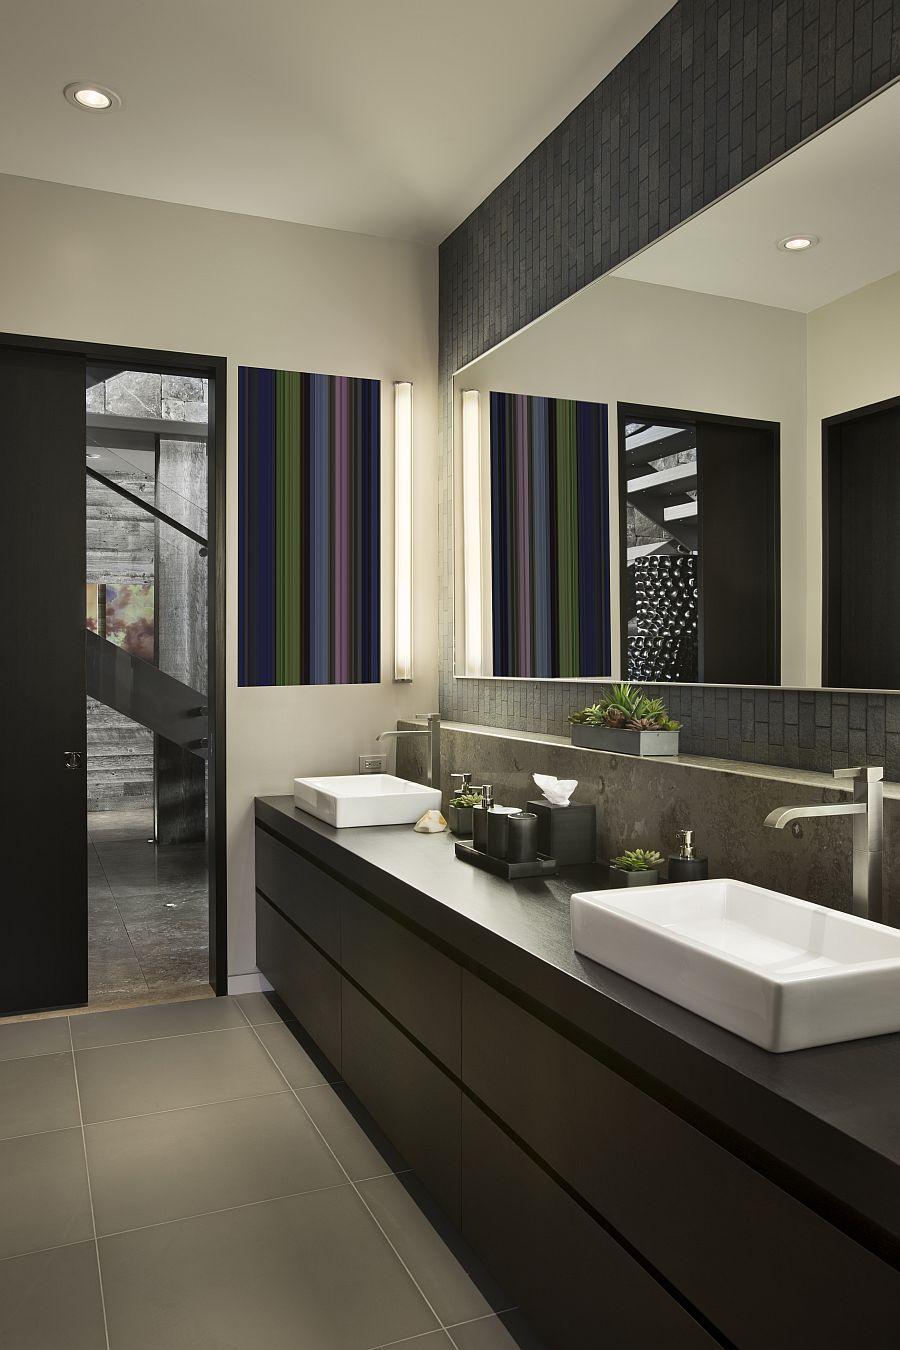 Banheiro amplo decorado